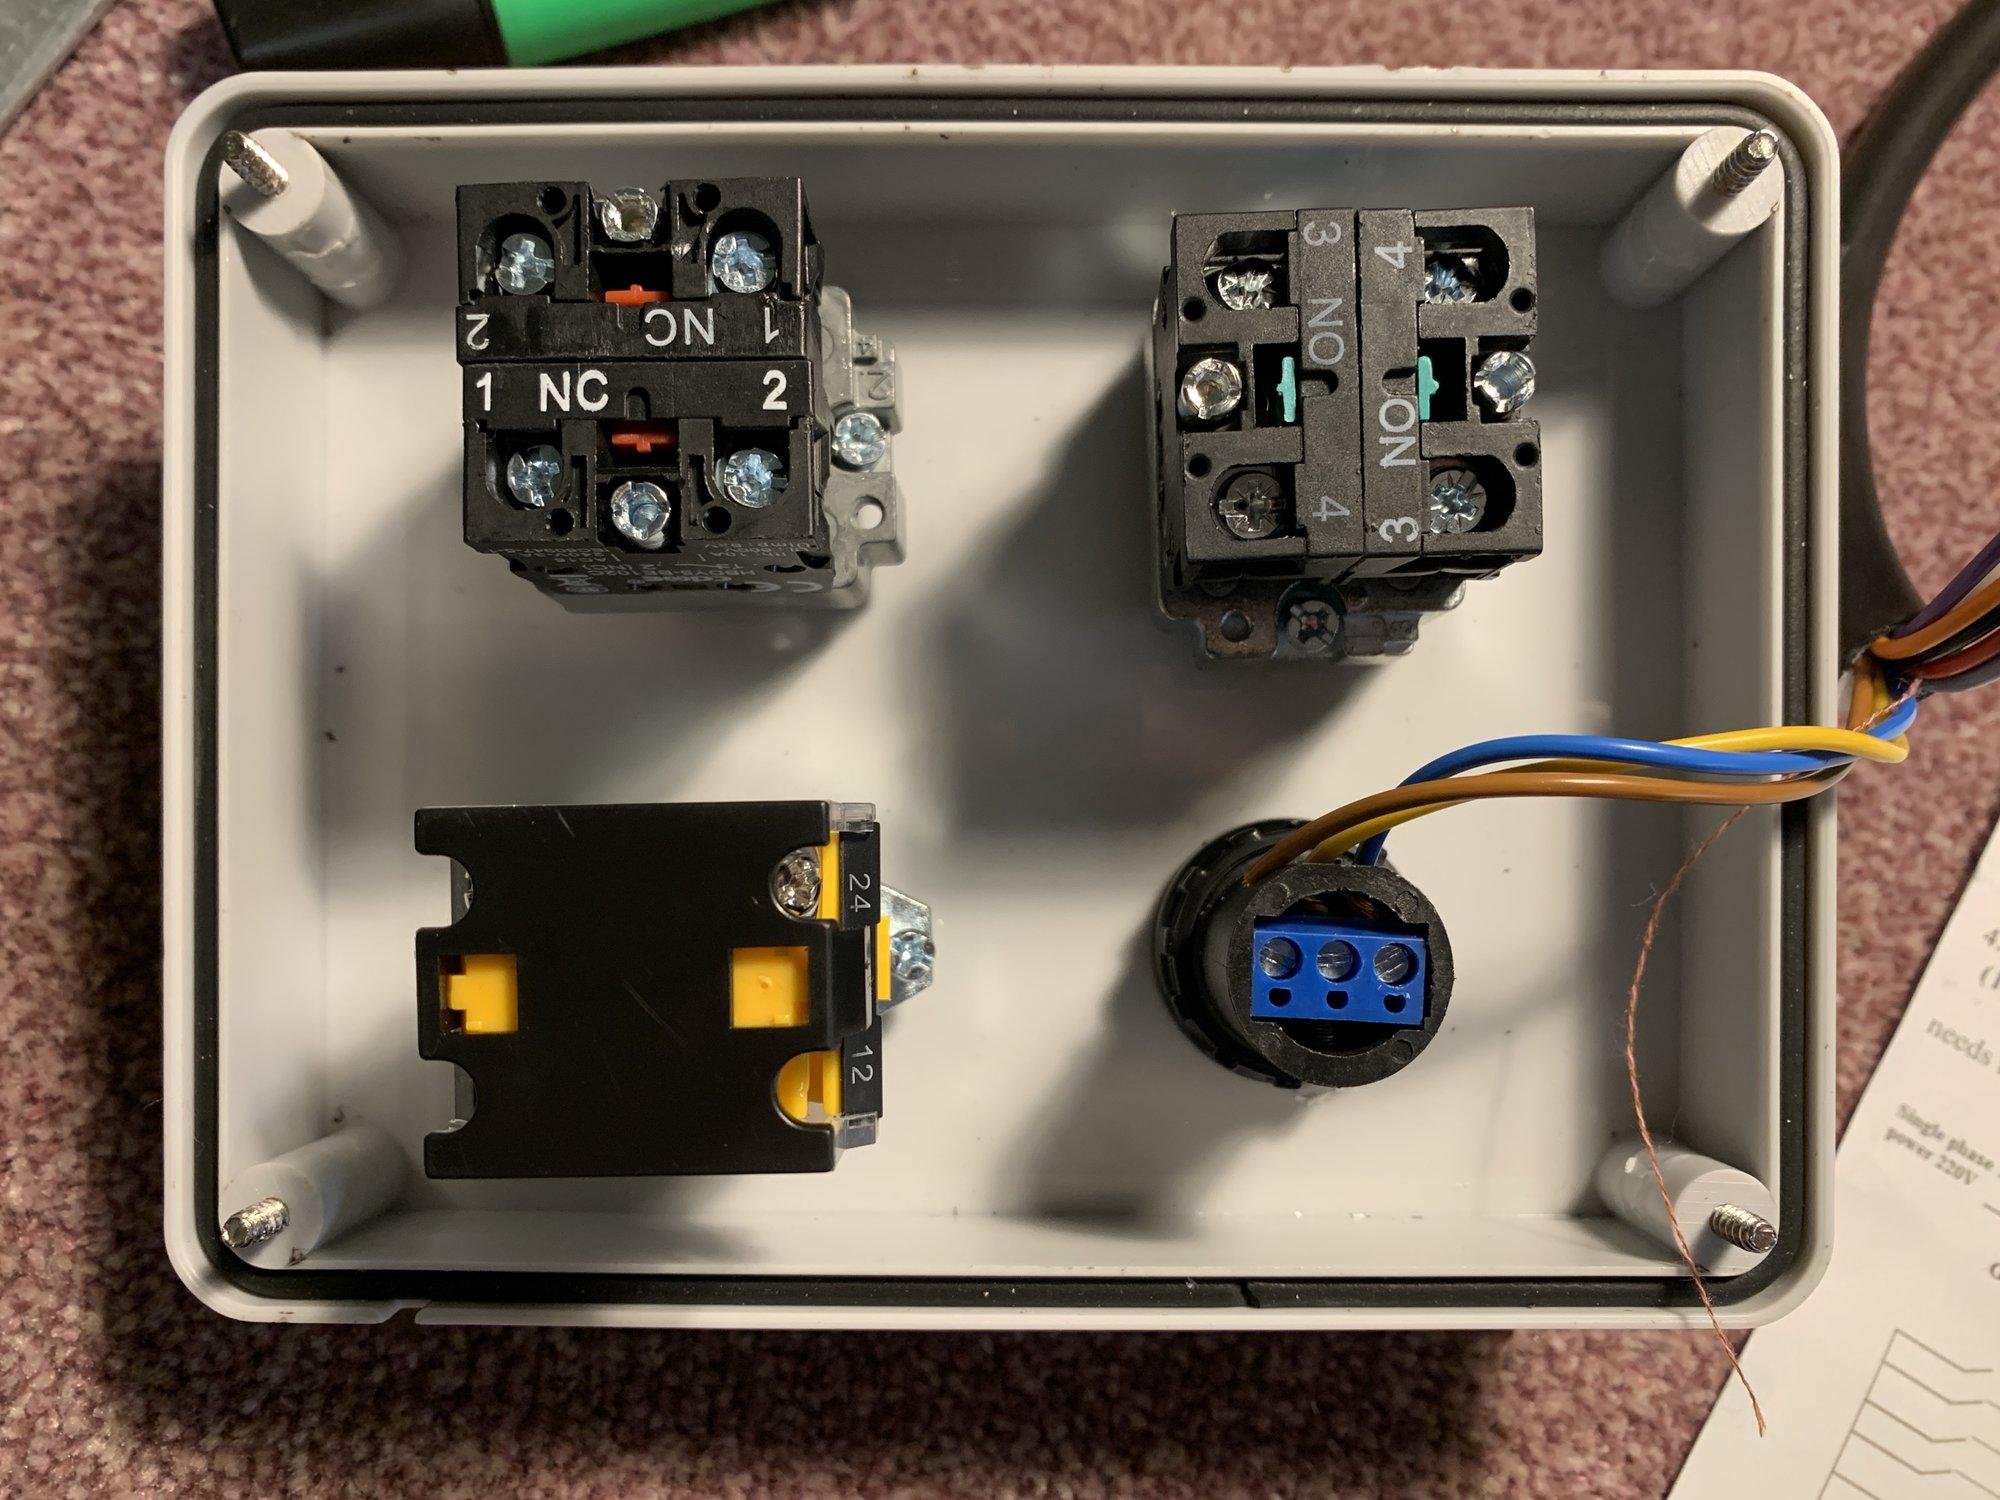 D6D5E00C-982C-4071-AF44-FE64F7672E04.jpeg